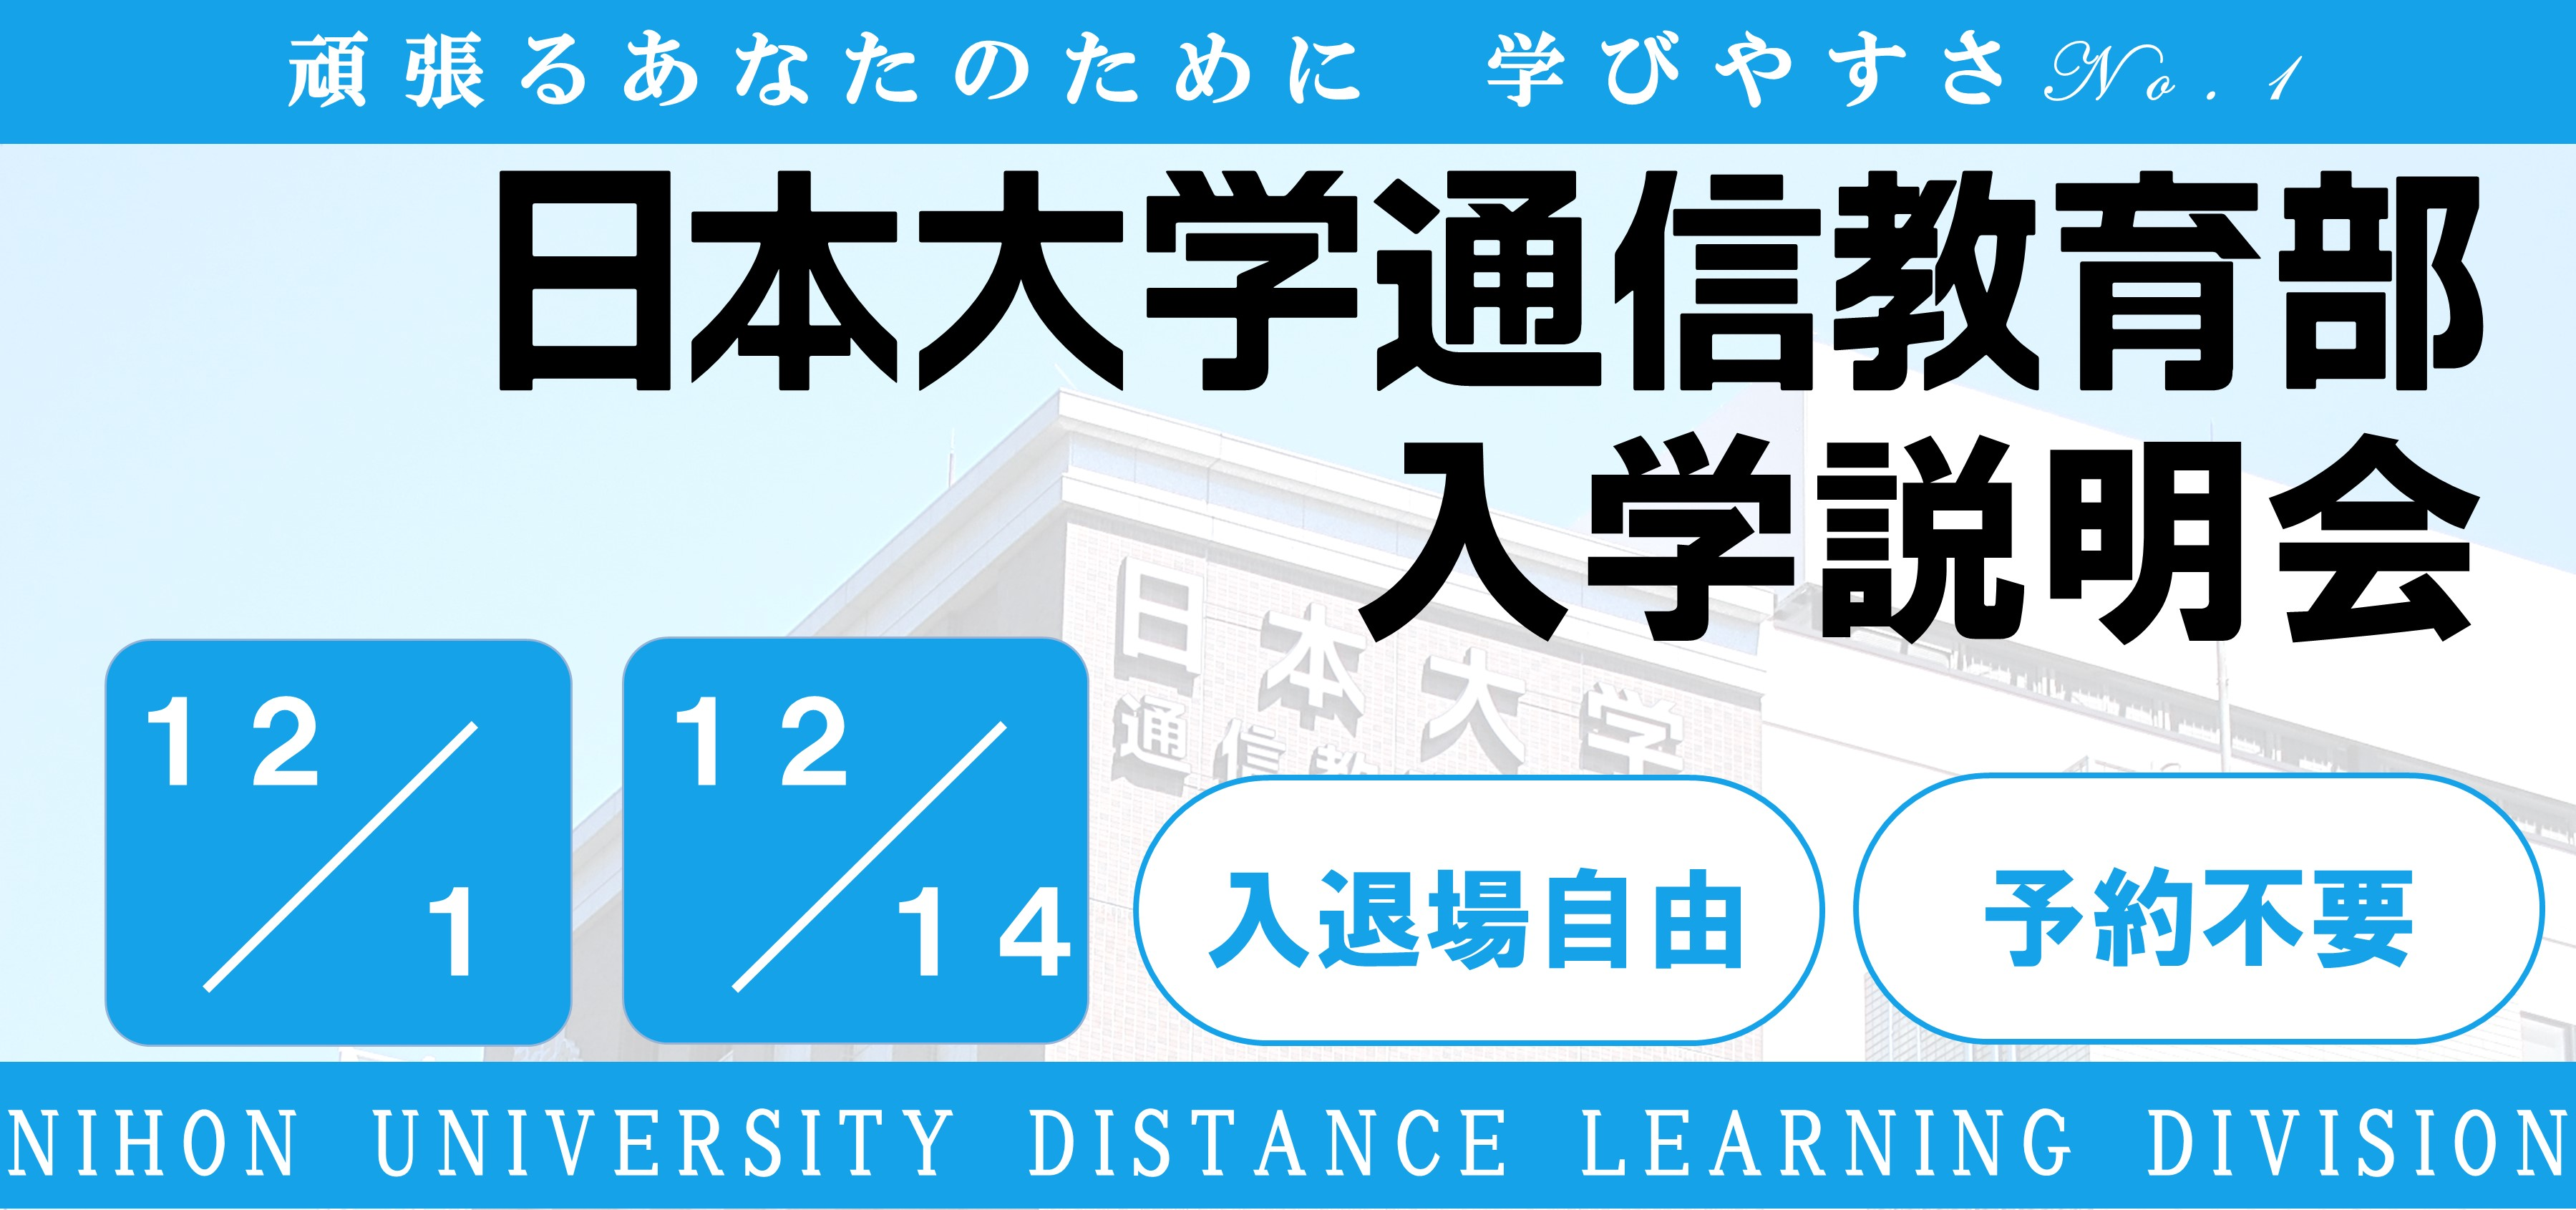 令和2年度4月入学向け説明会(12月)